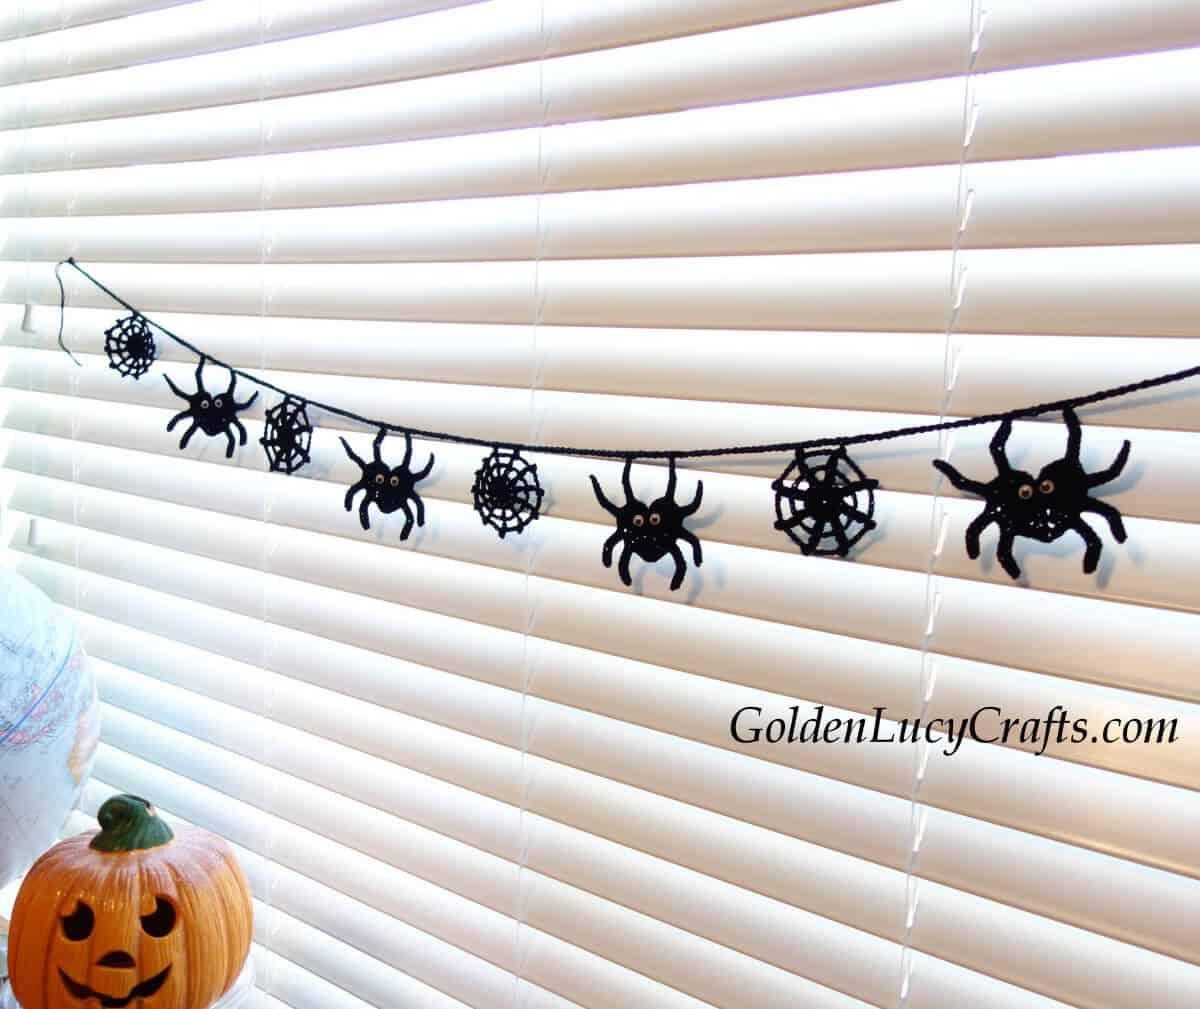 Crocheted Halloween garland hanging on the window.